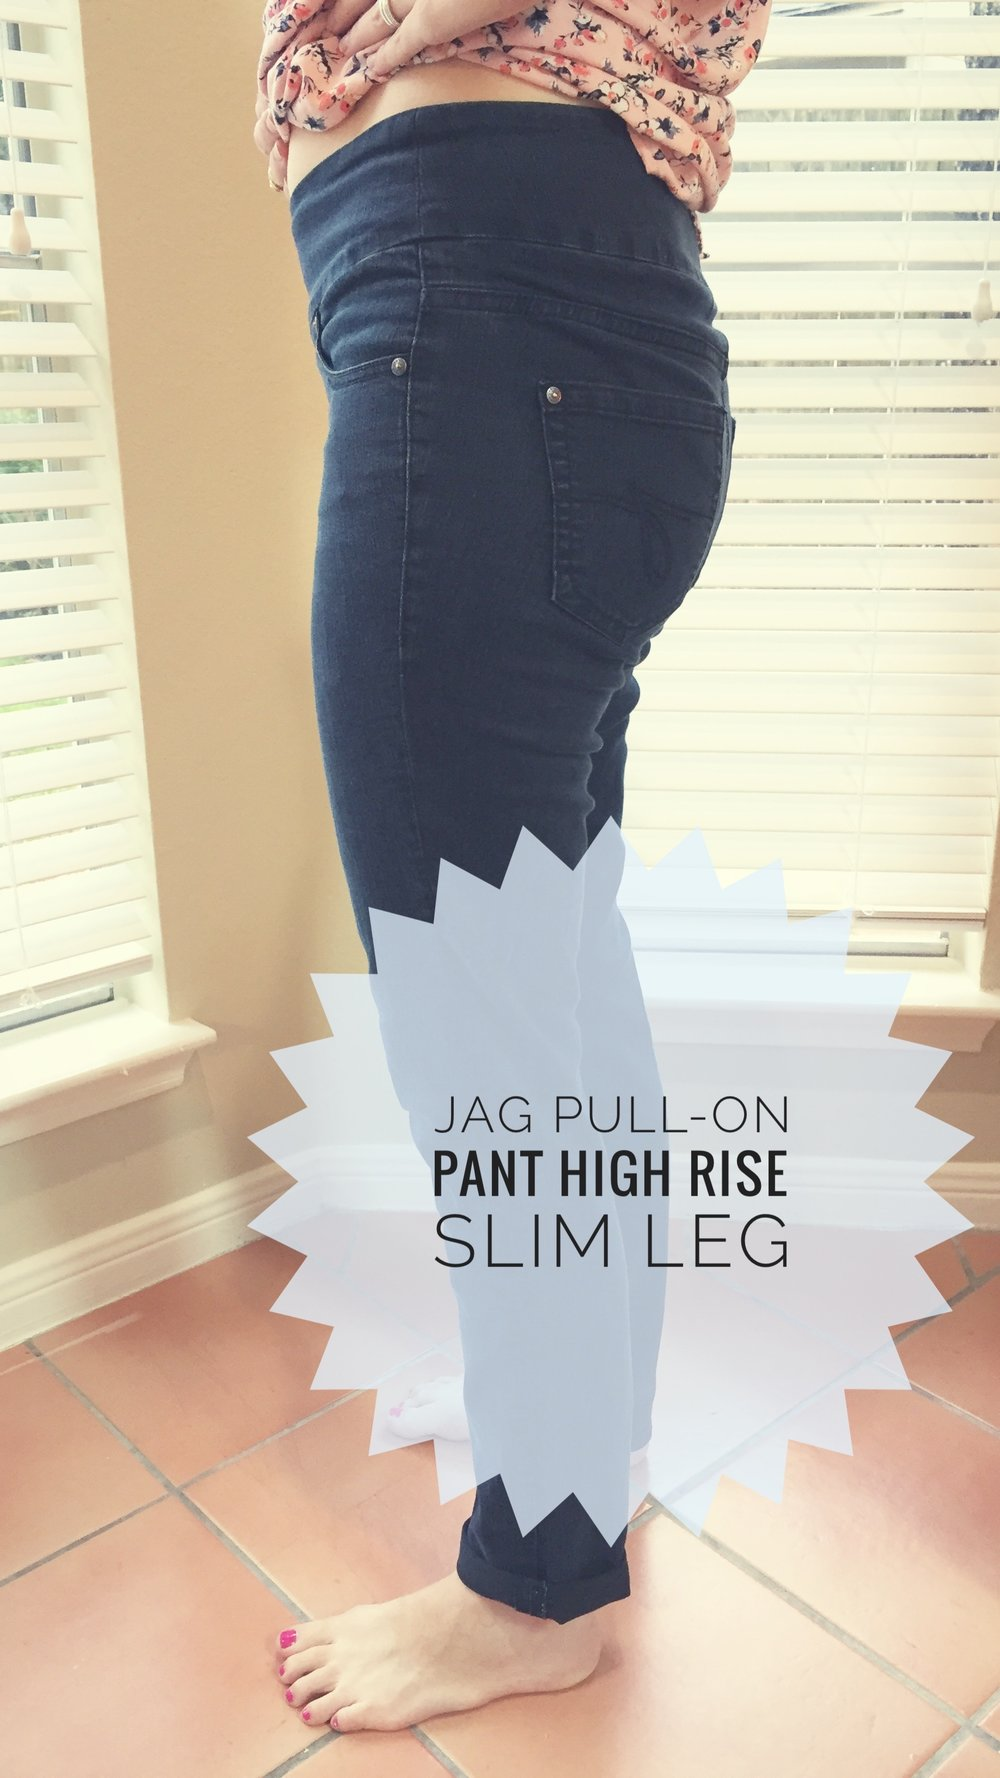 Maternity Jeans Test, Lisa Rutledge Midwife - 2.jpg